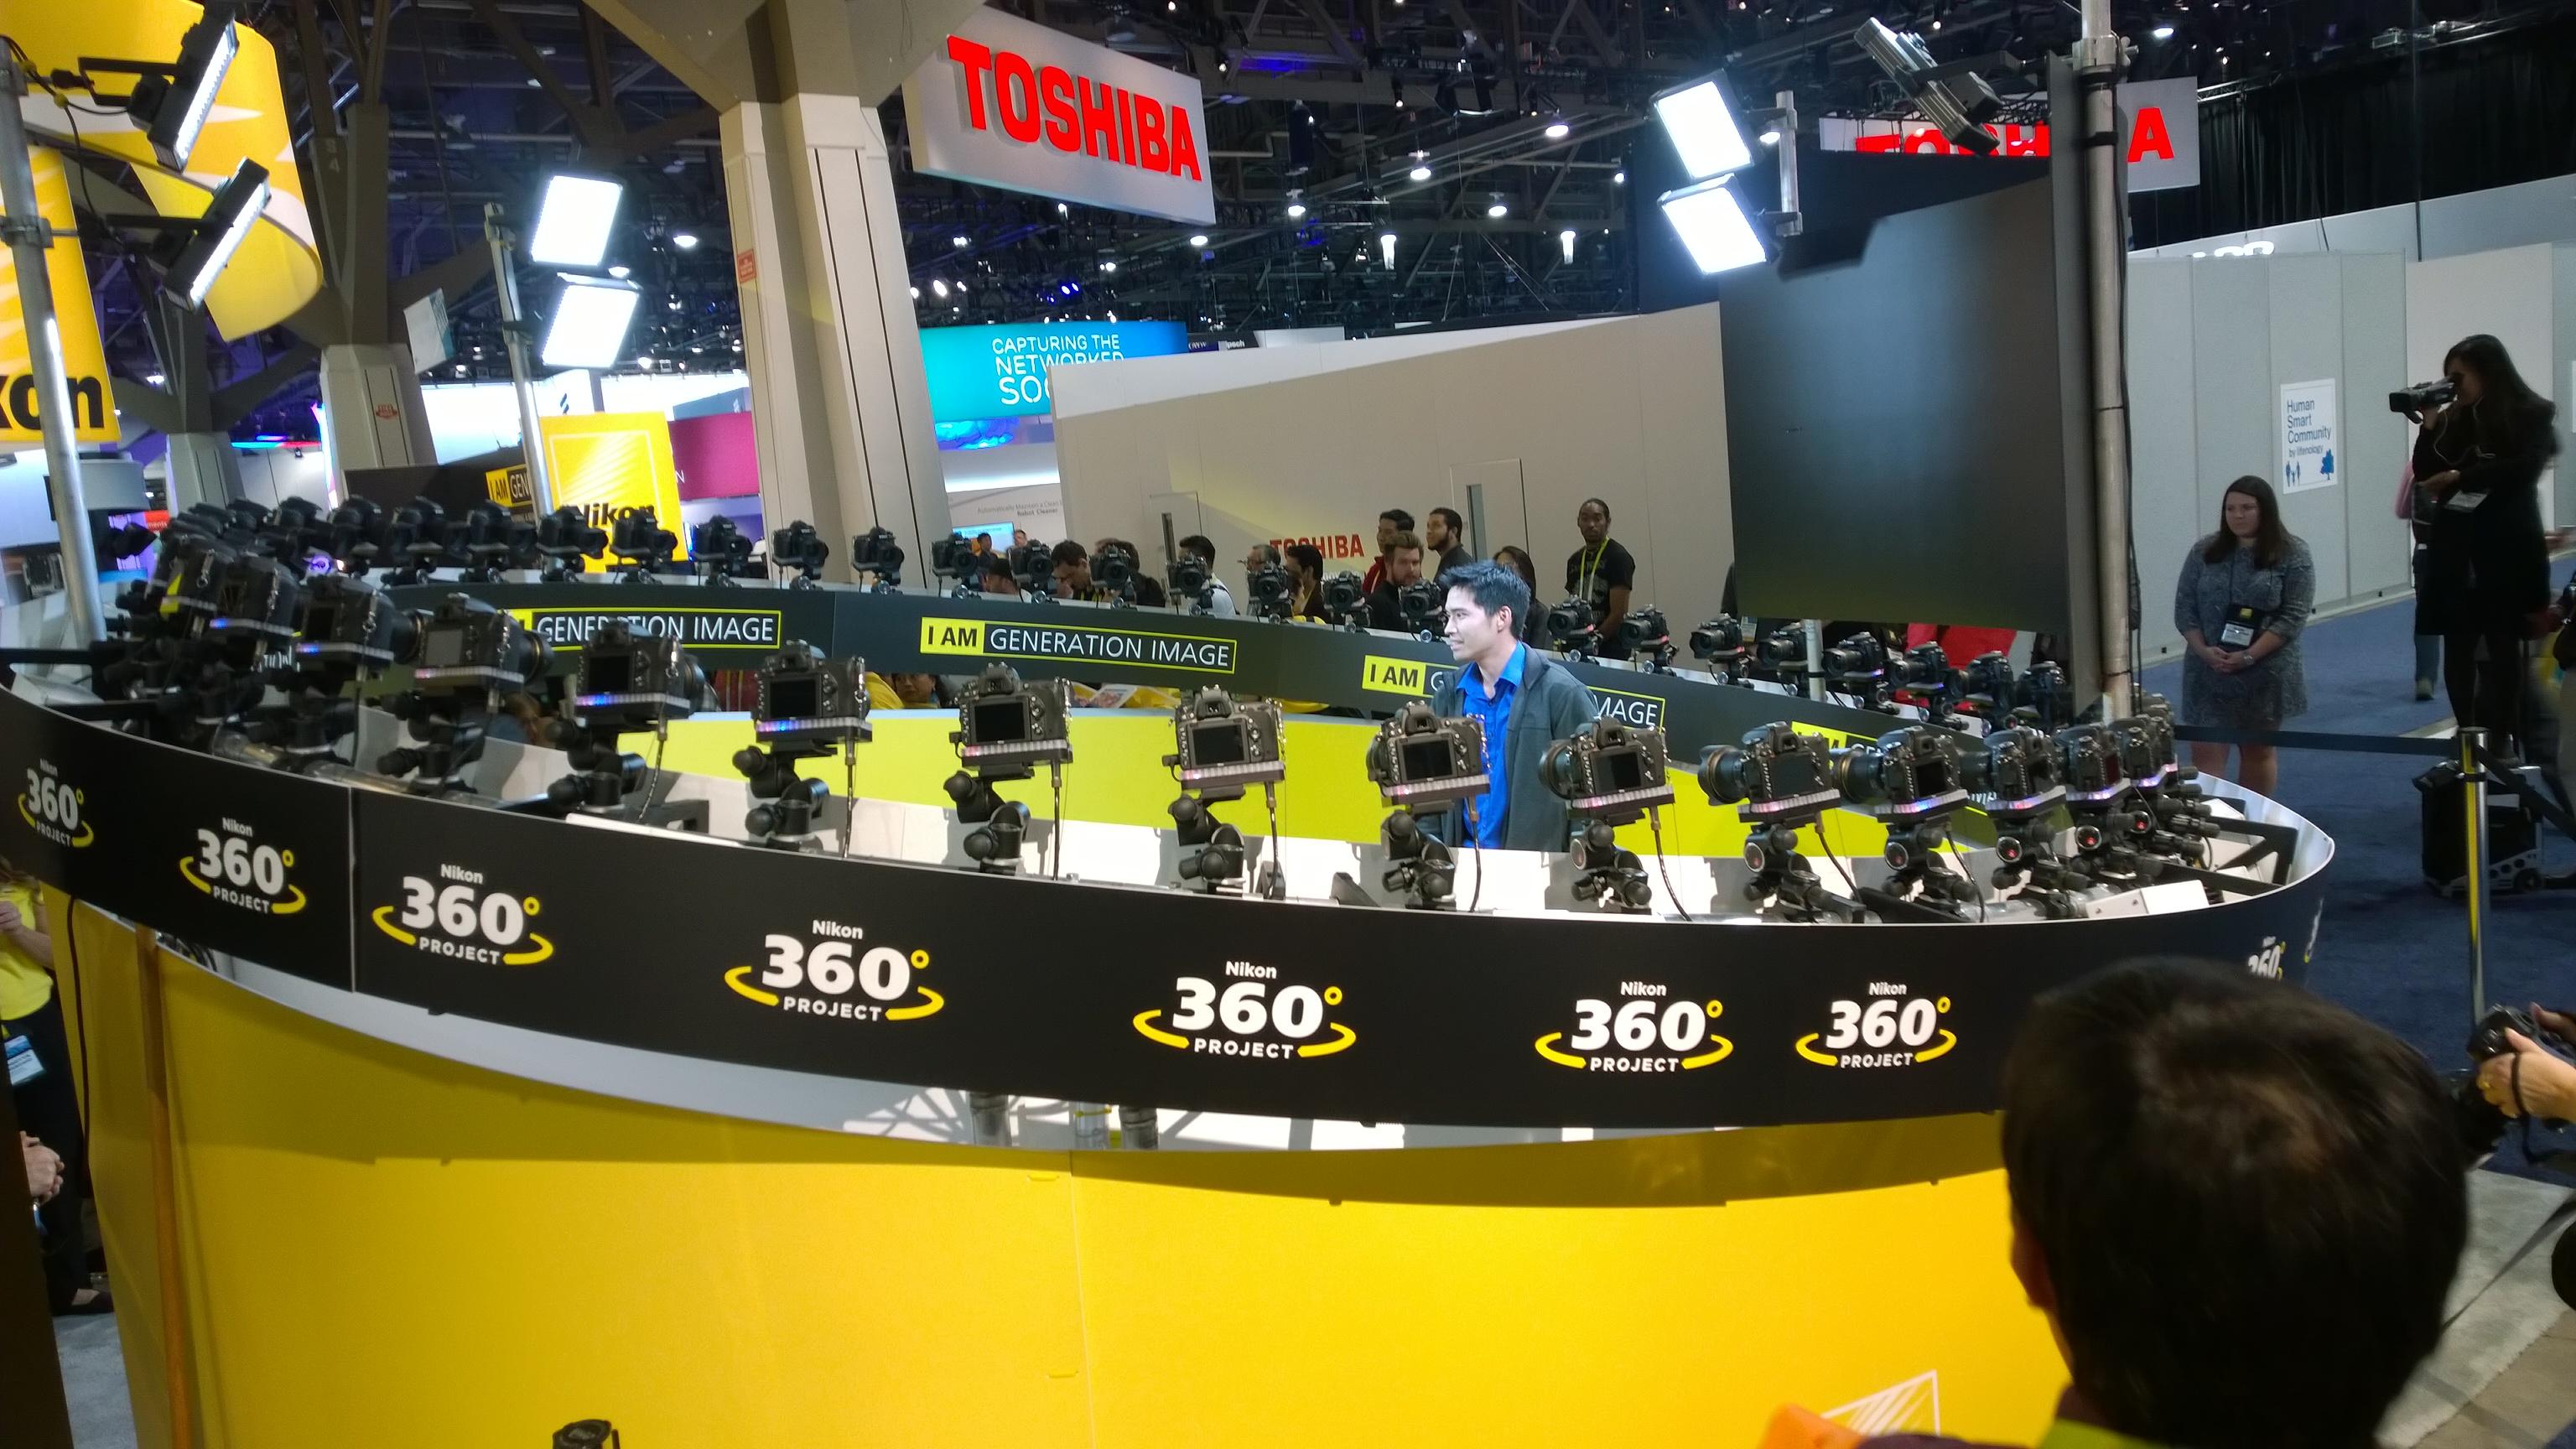 The 360-degree photo setup was impressive